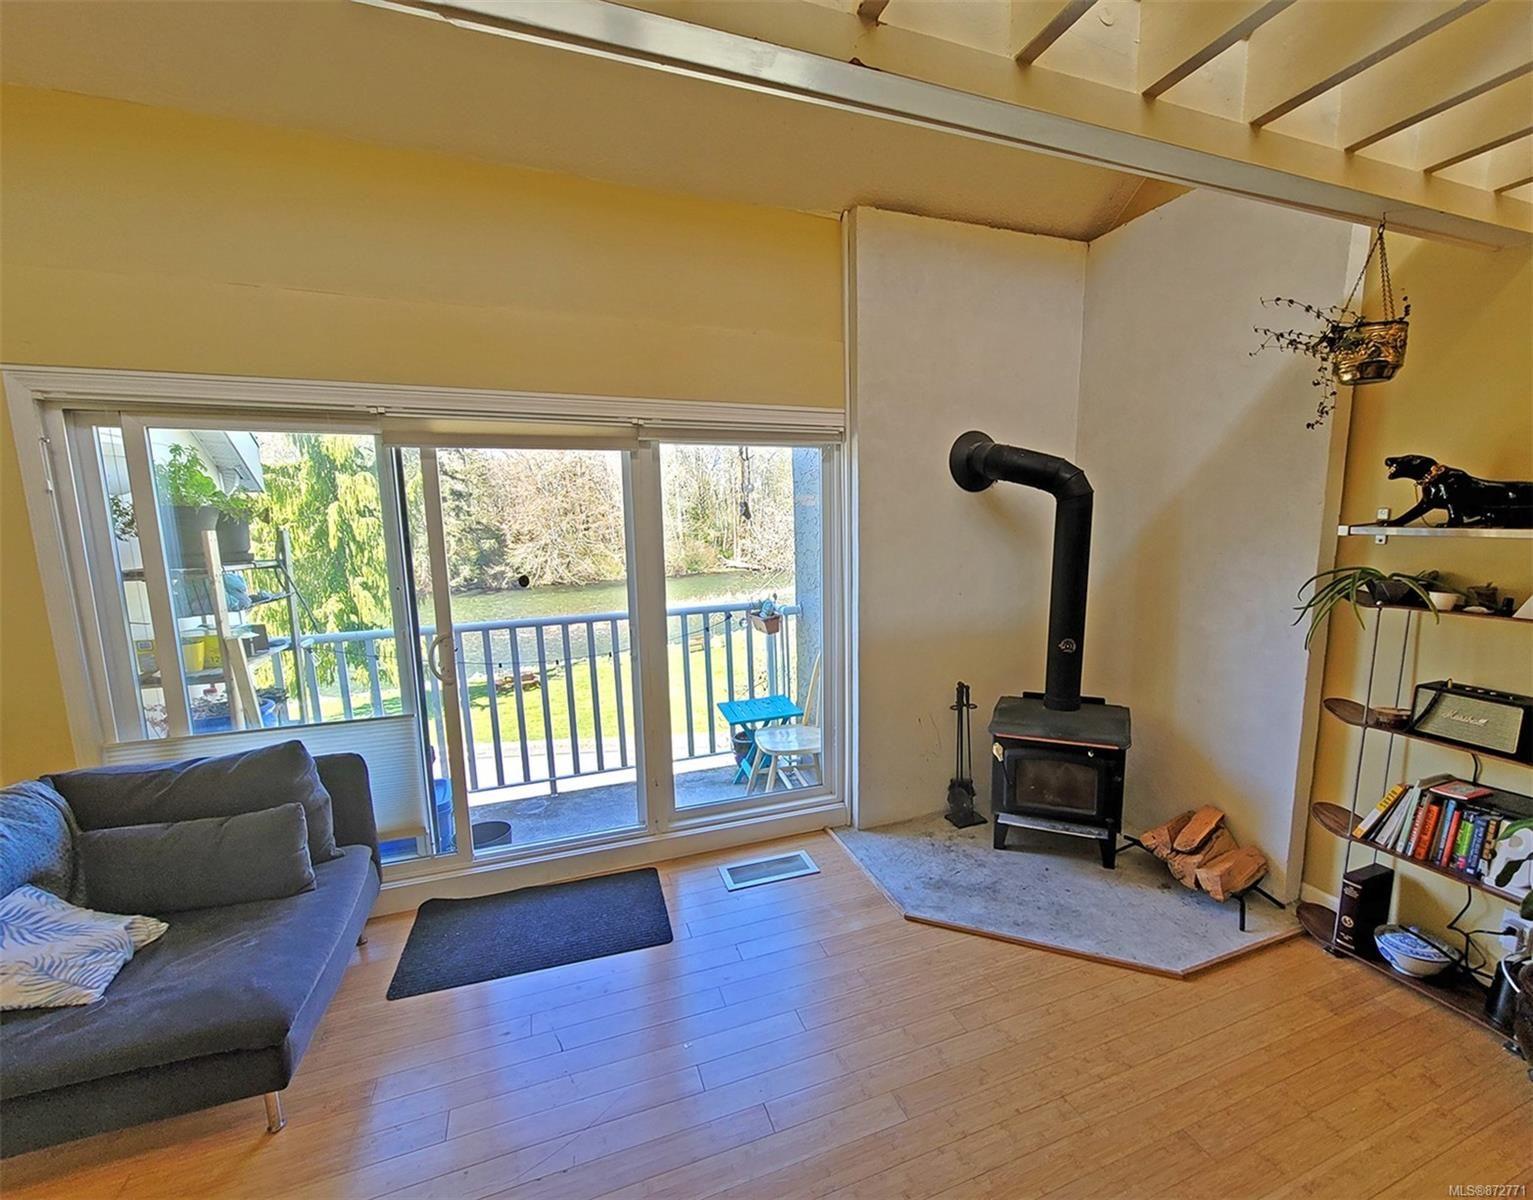 Photo 2: Photos: 305 205 1st St in : CV Courtenay City Condo for sale (Comox Valley)  : MLS®# 872771